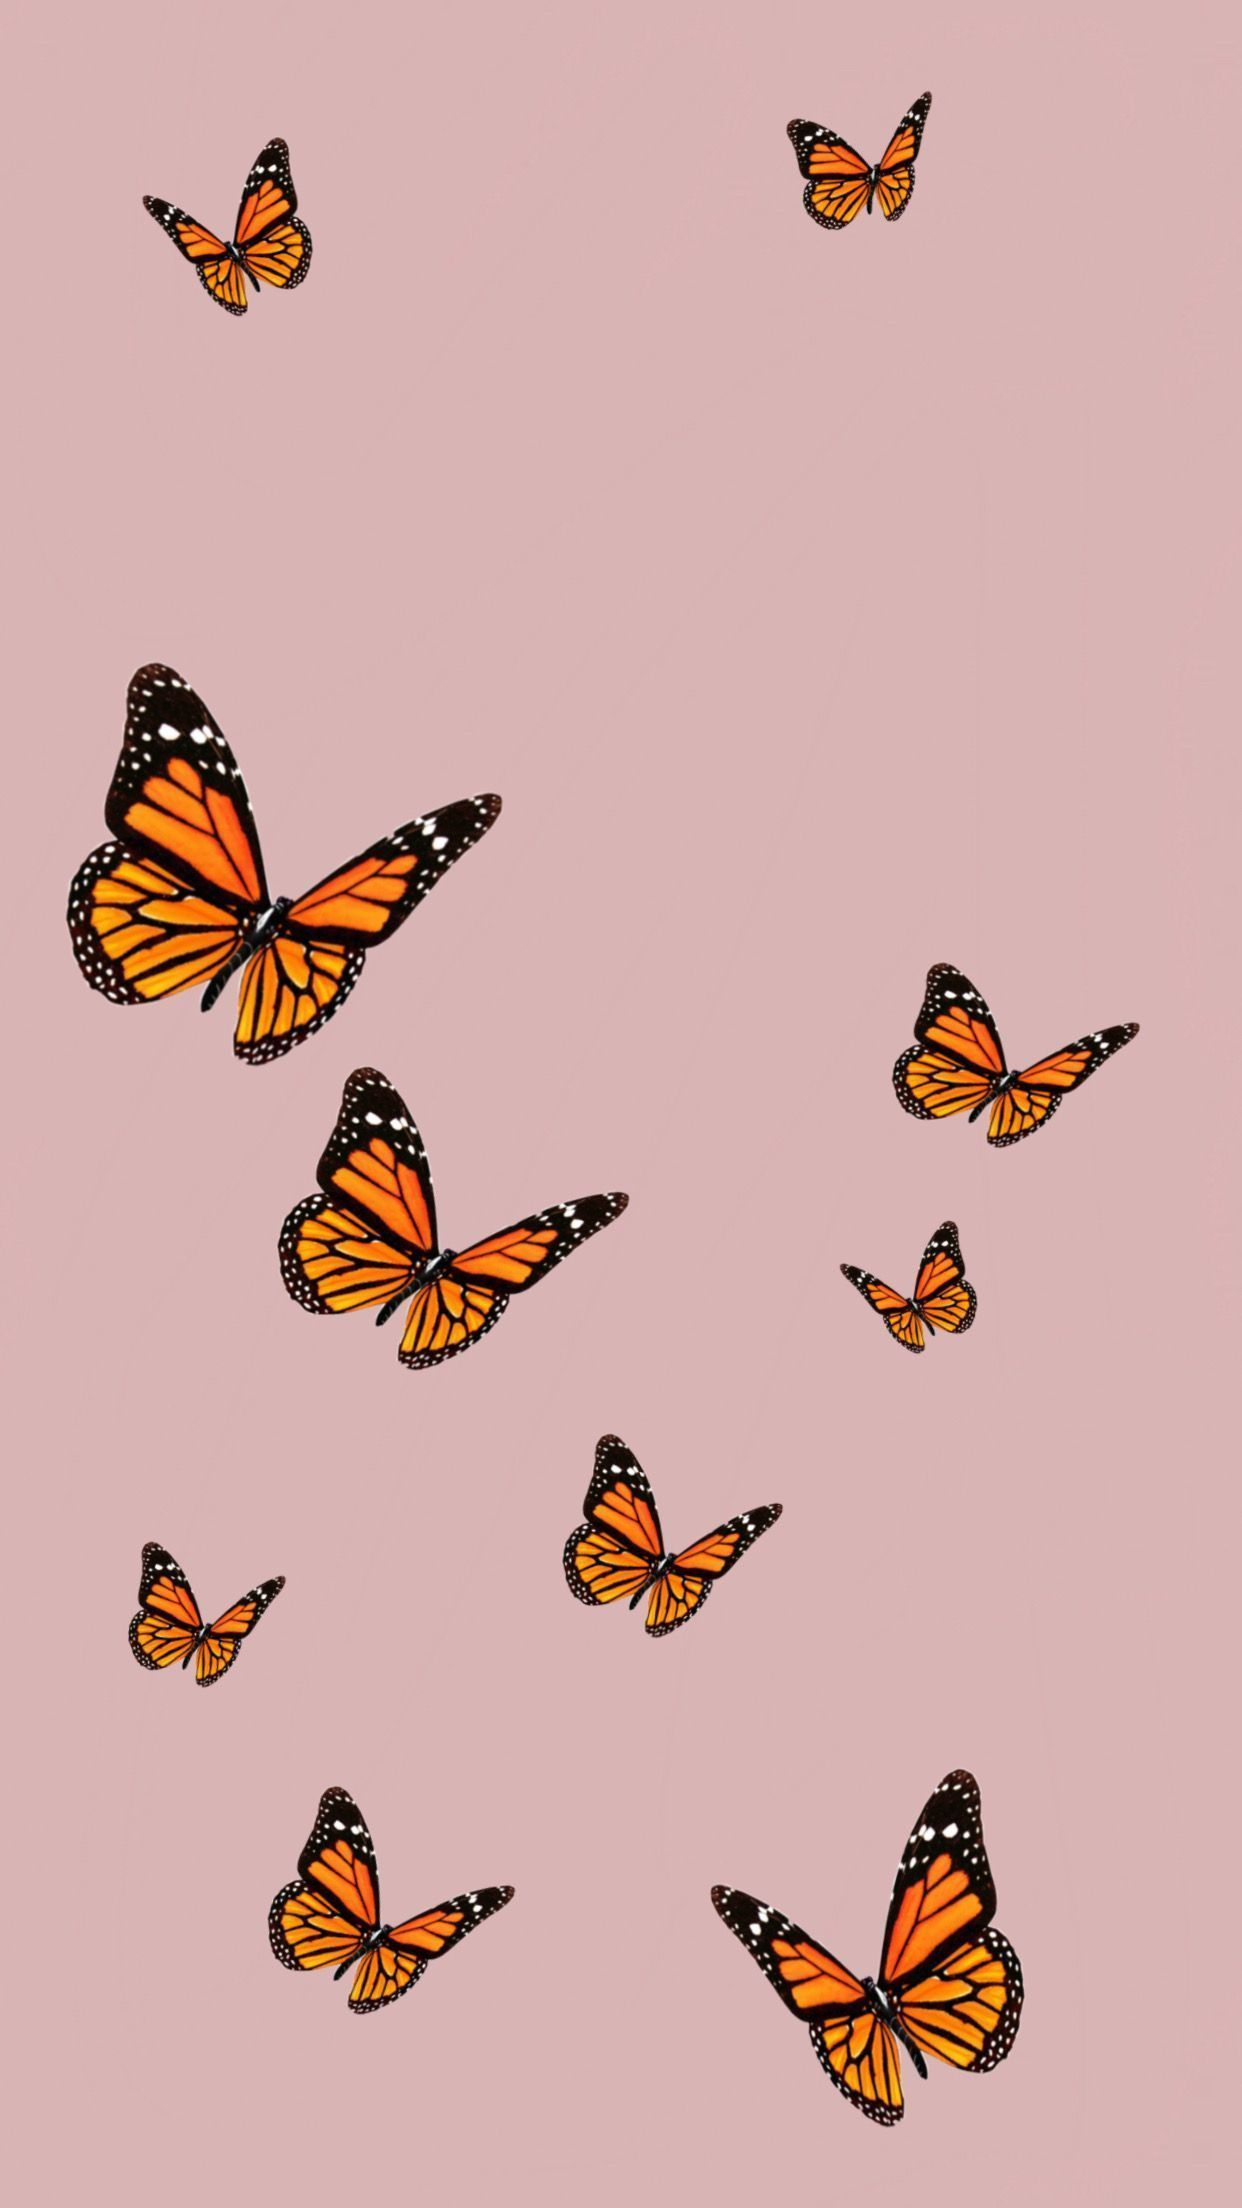 Cute Butterfly Wallpapers - Top Free Cute Butterfly ...